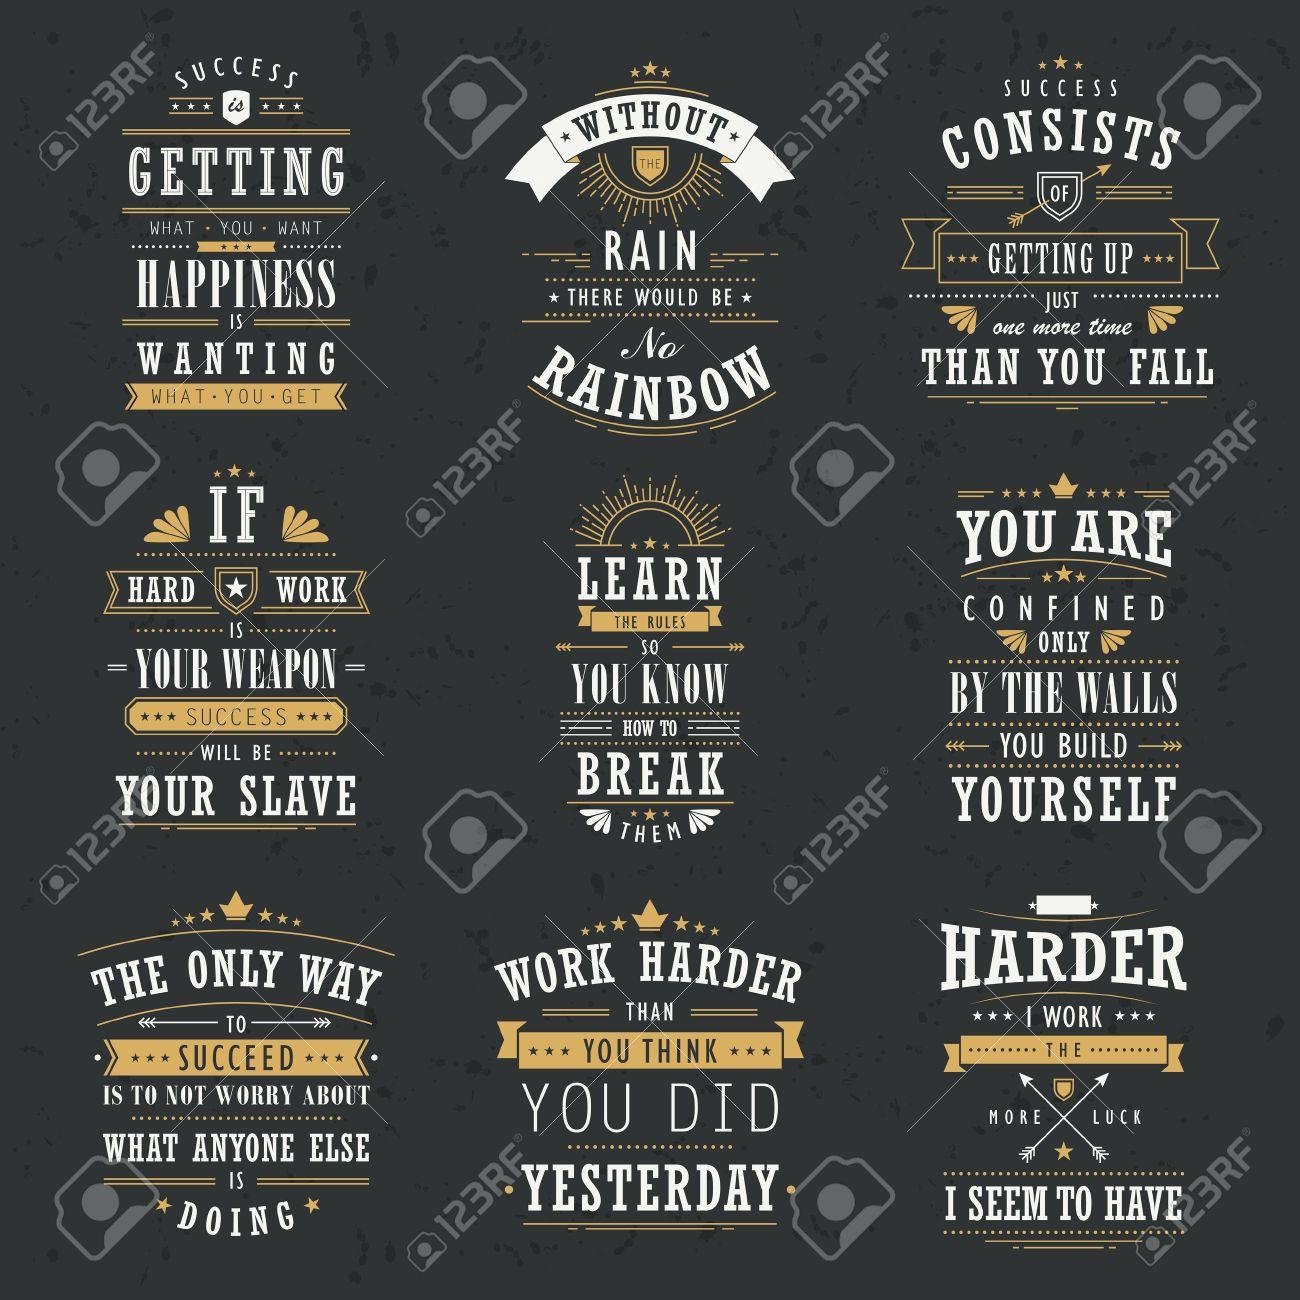 Inspirational Quotes About Success Success Motivational And Inspirational Quotes Set Isolated On